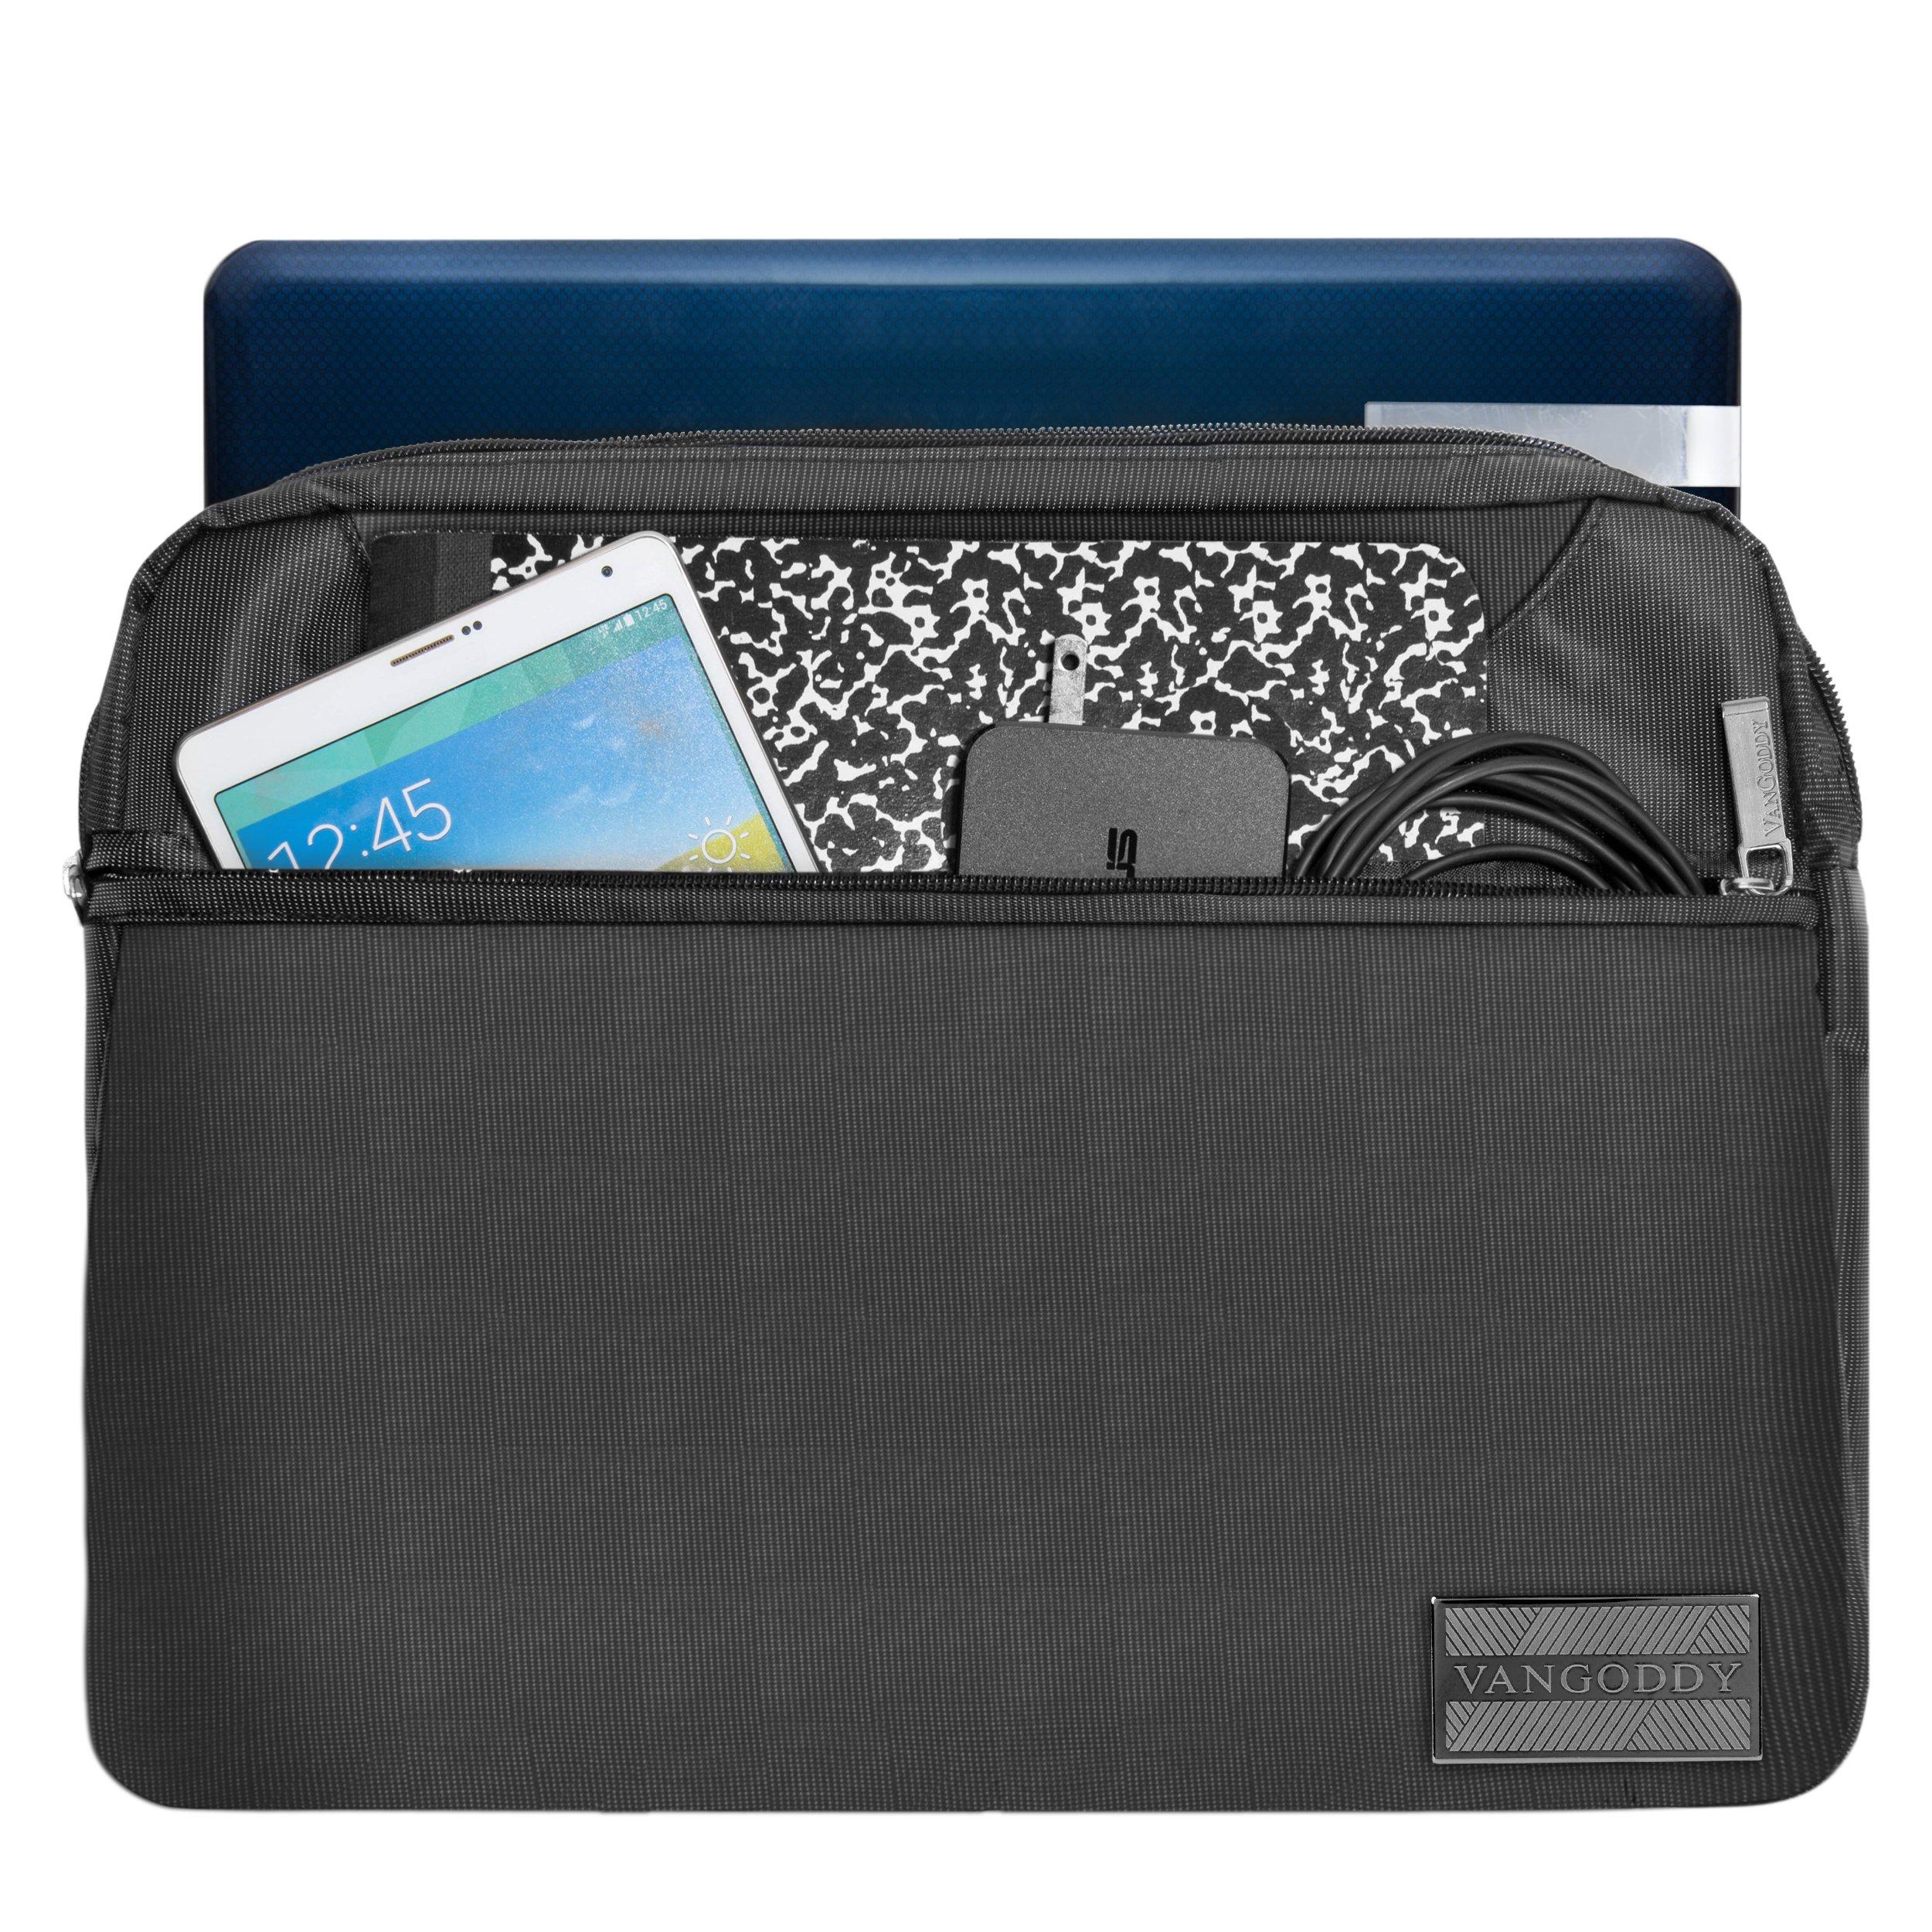 VanGoddy NineO Slim Slate Grey Messenger Bag for Microsoft Surface Laptop / Surface Book / Surface Pro Series 11''-13.5in by Vangoddy (Image #2)